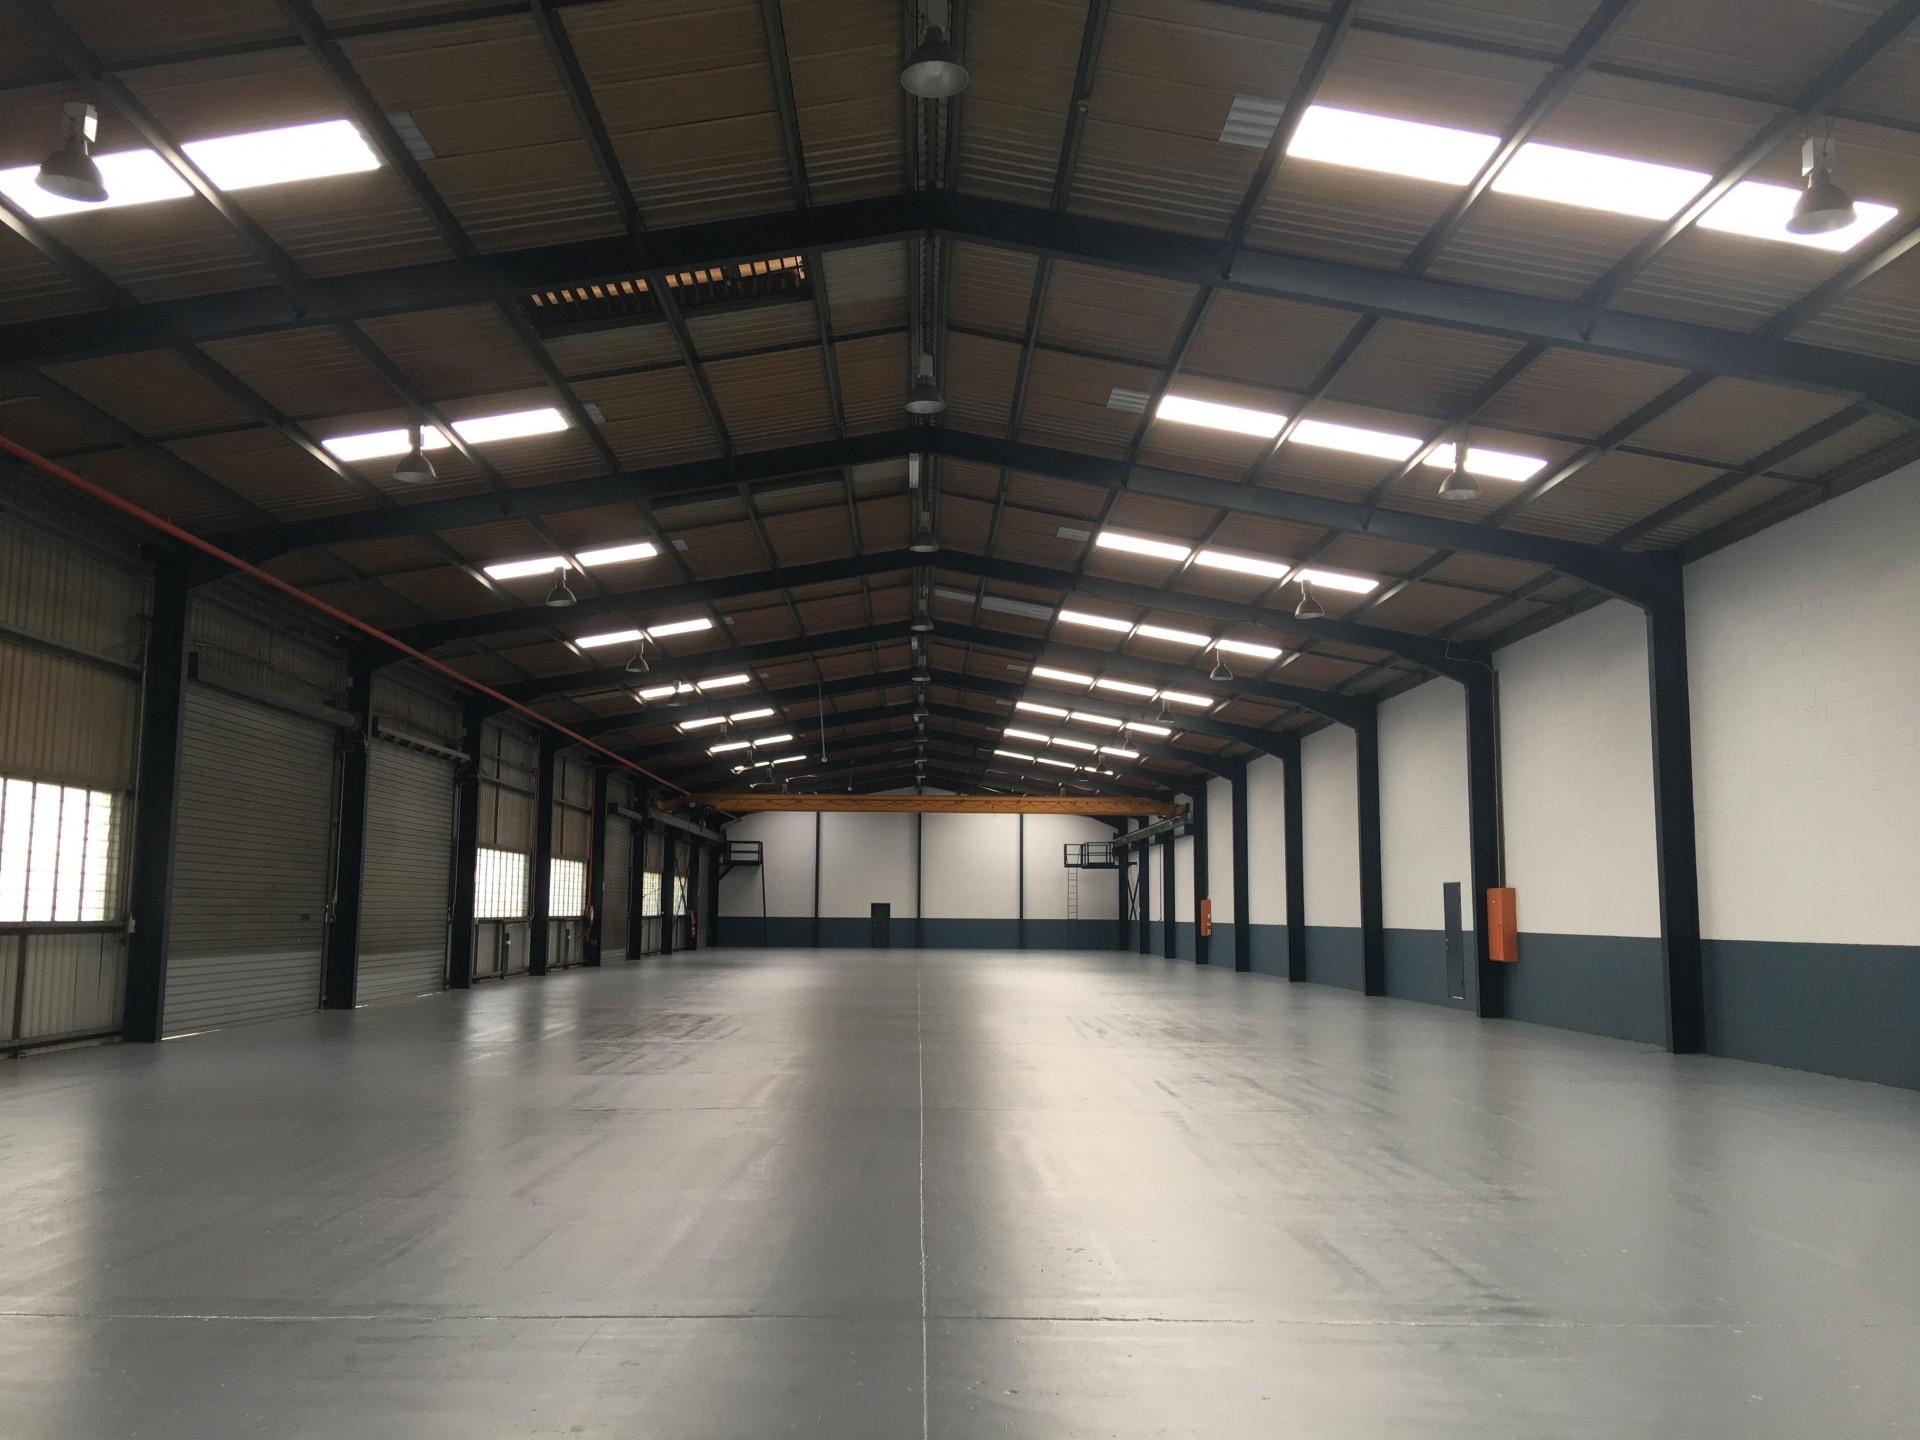 Fully Refurbished Tingalpa Warehouse - Great Opportunity